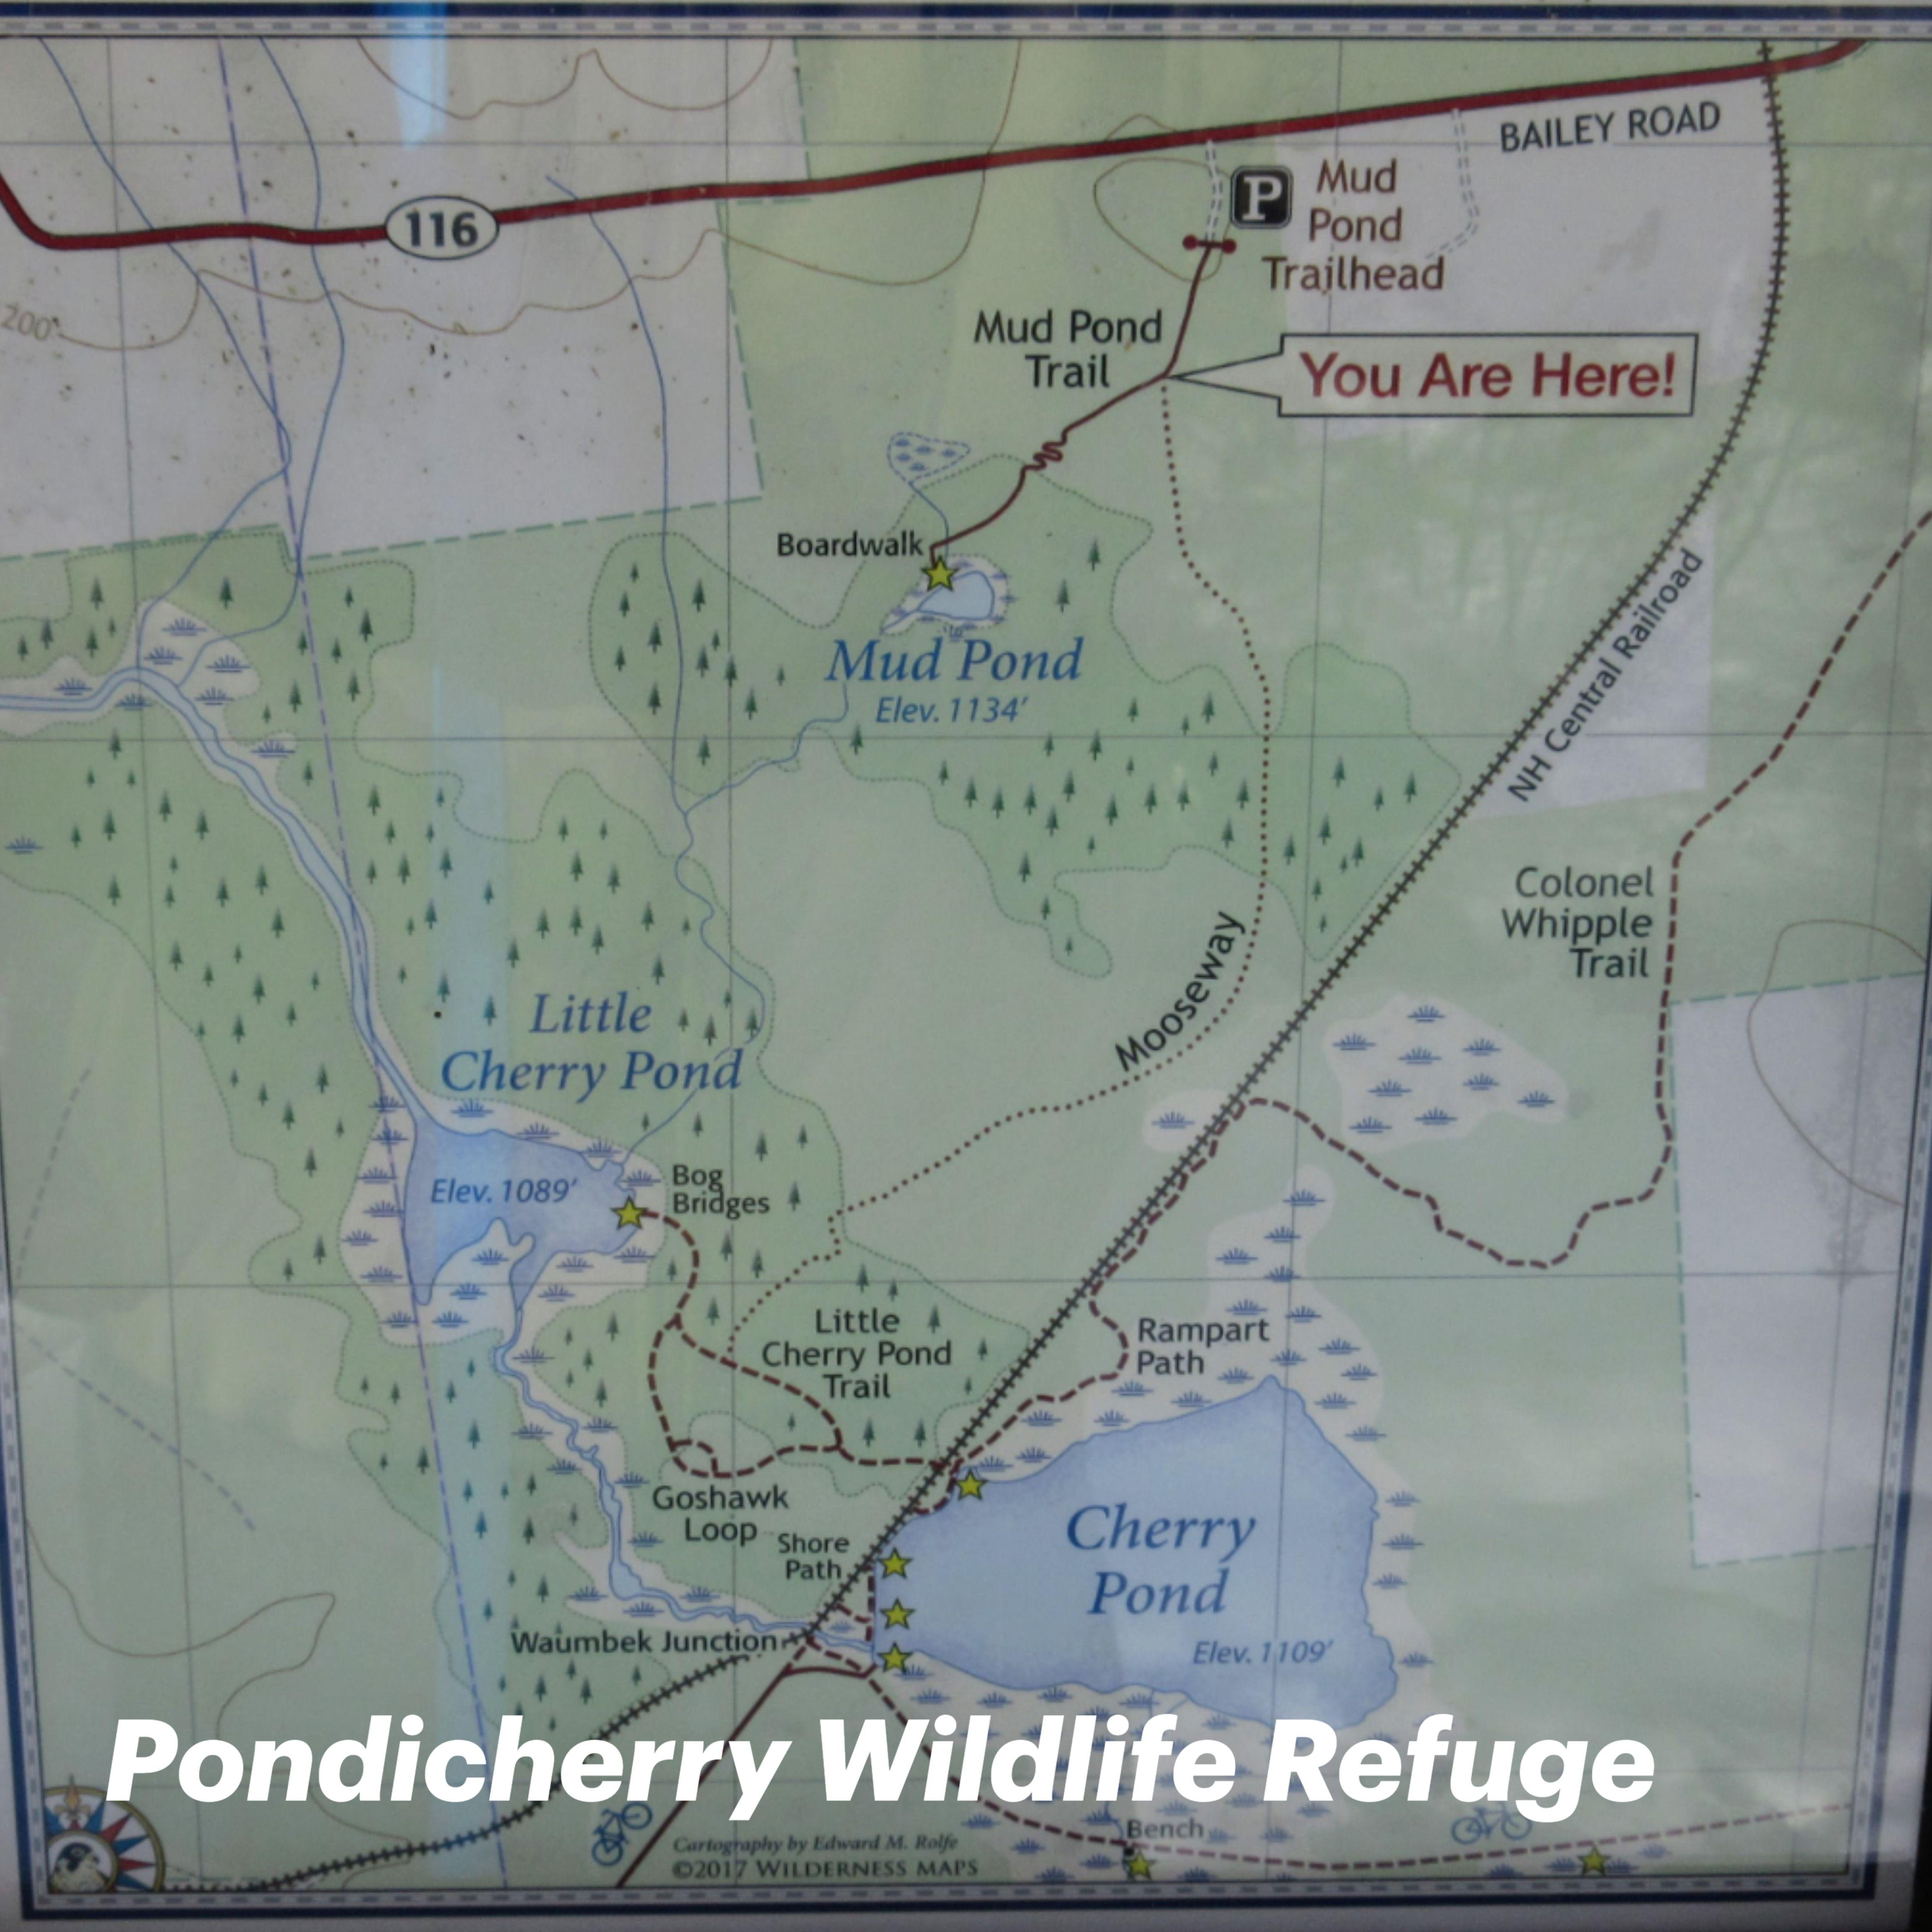 Pondicherry Wildlife Refuge in 2020 Wildlife refuge